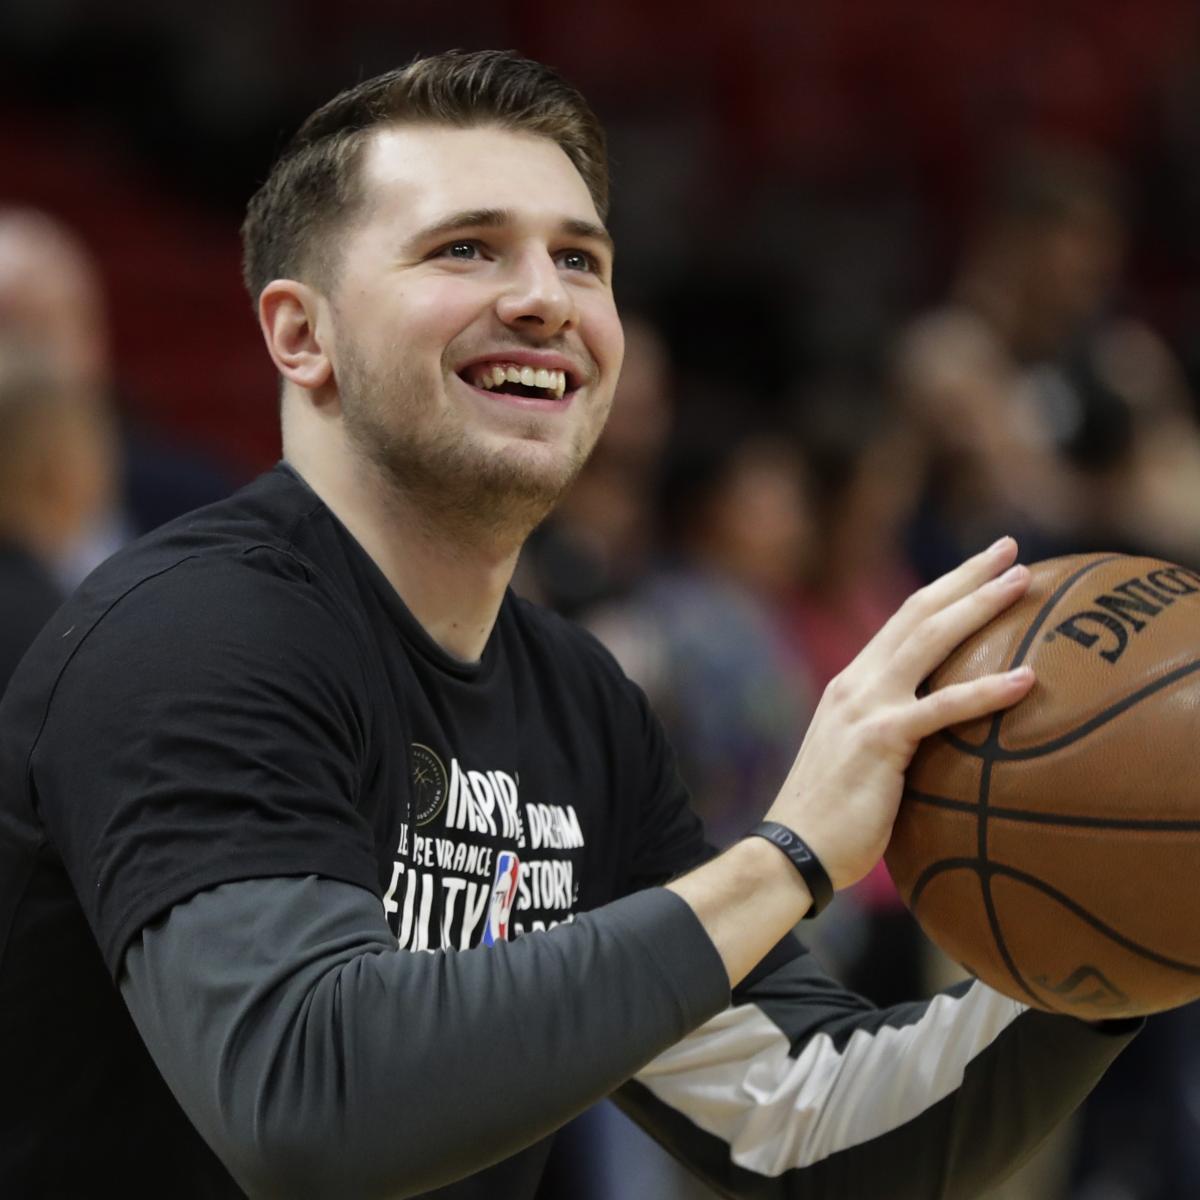 Predicting the NBA's Top 5 Stars over the Next 5 Seasons